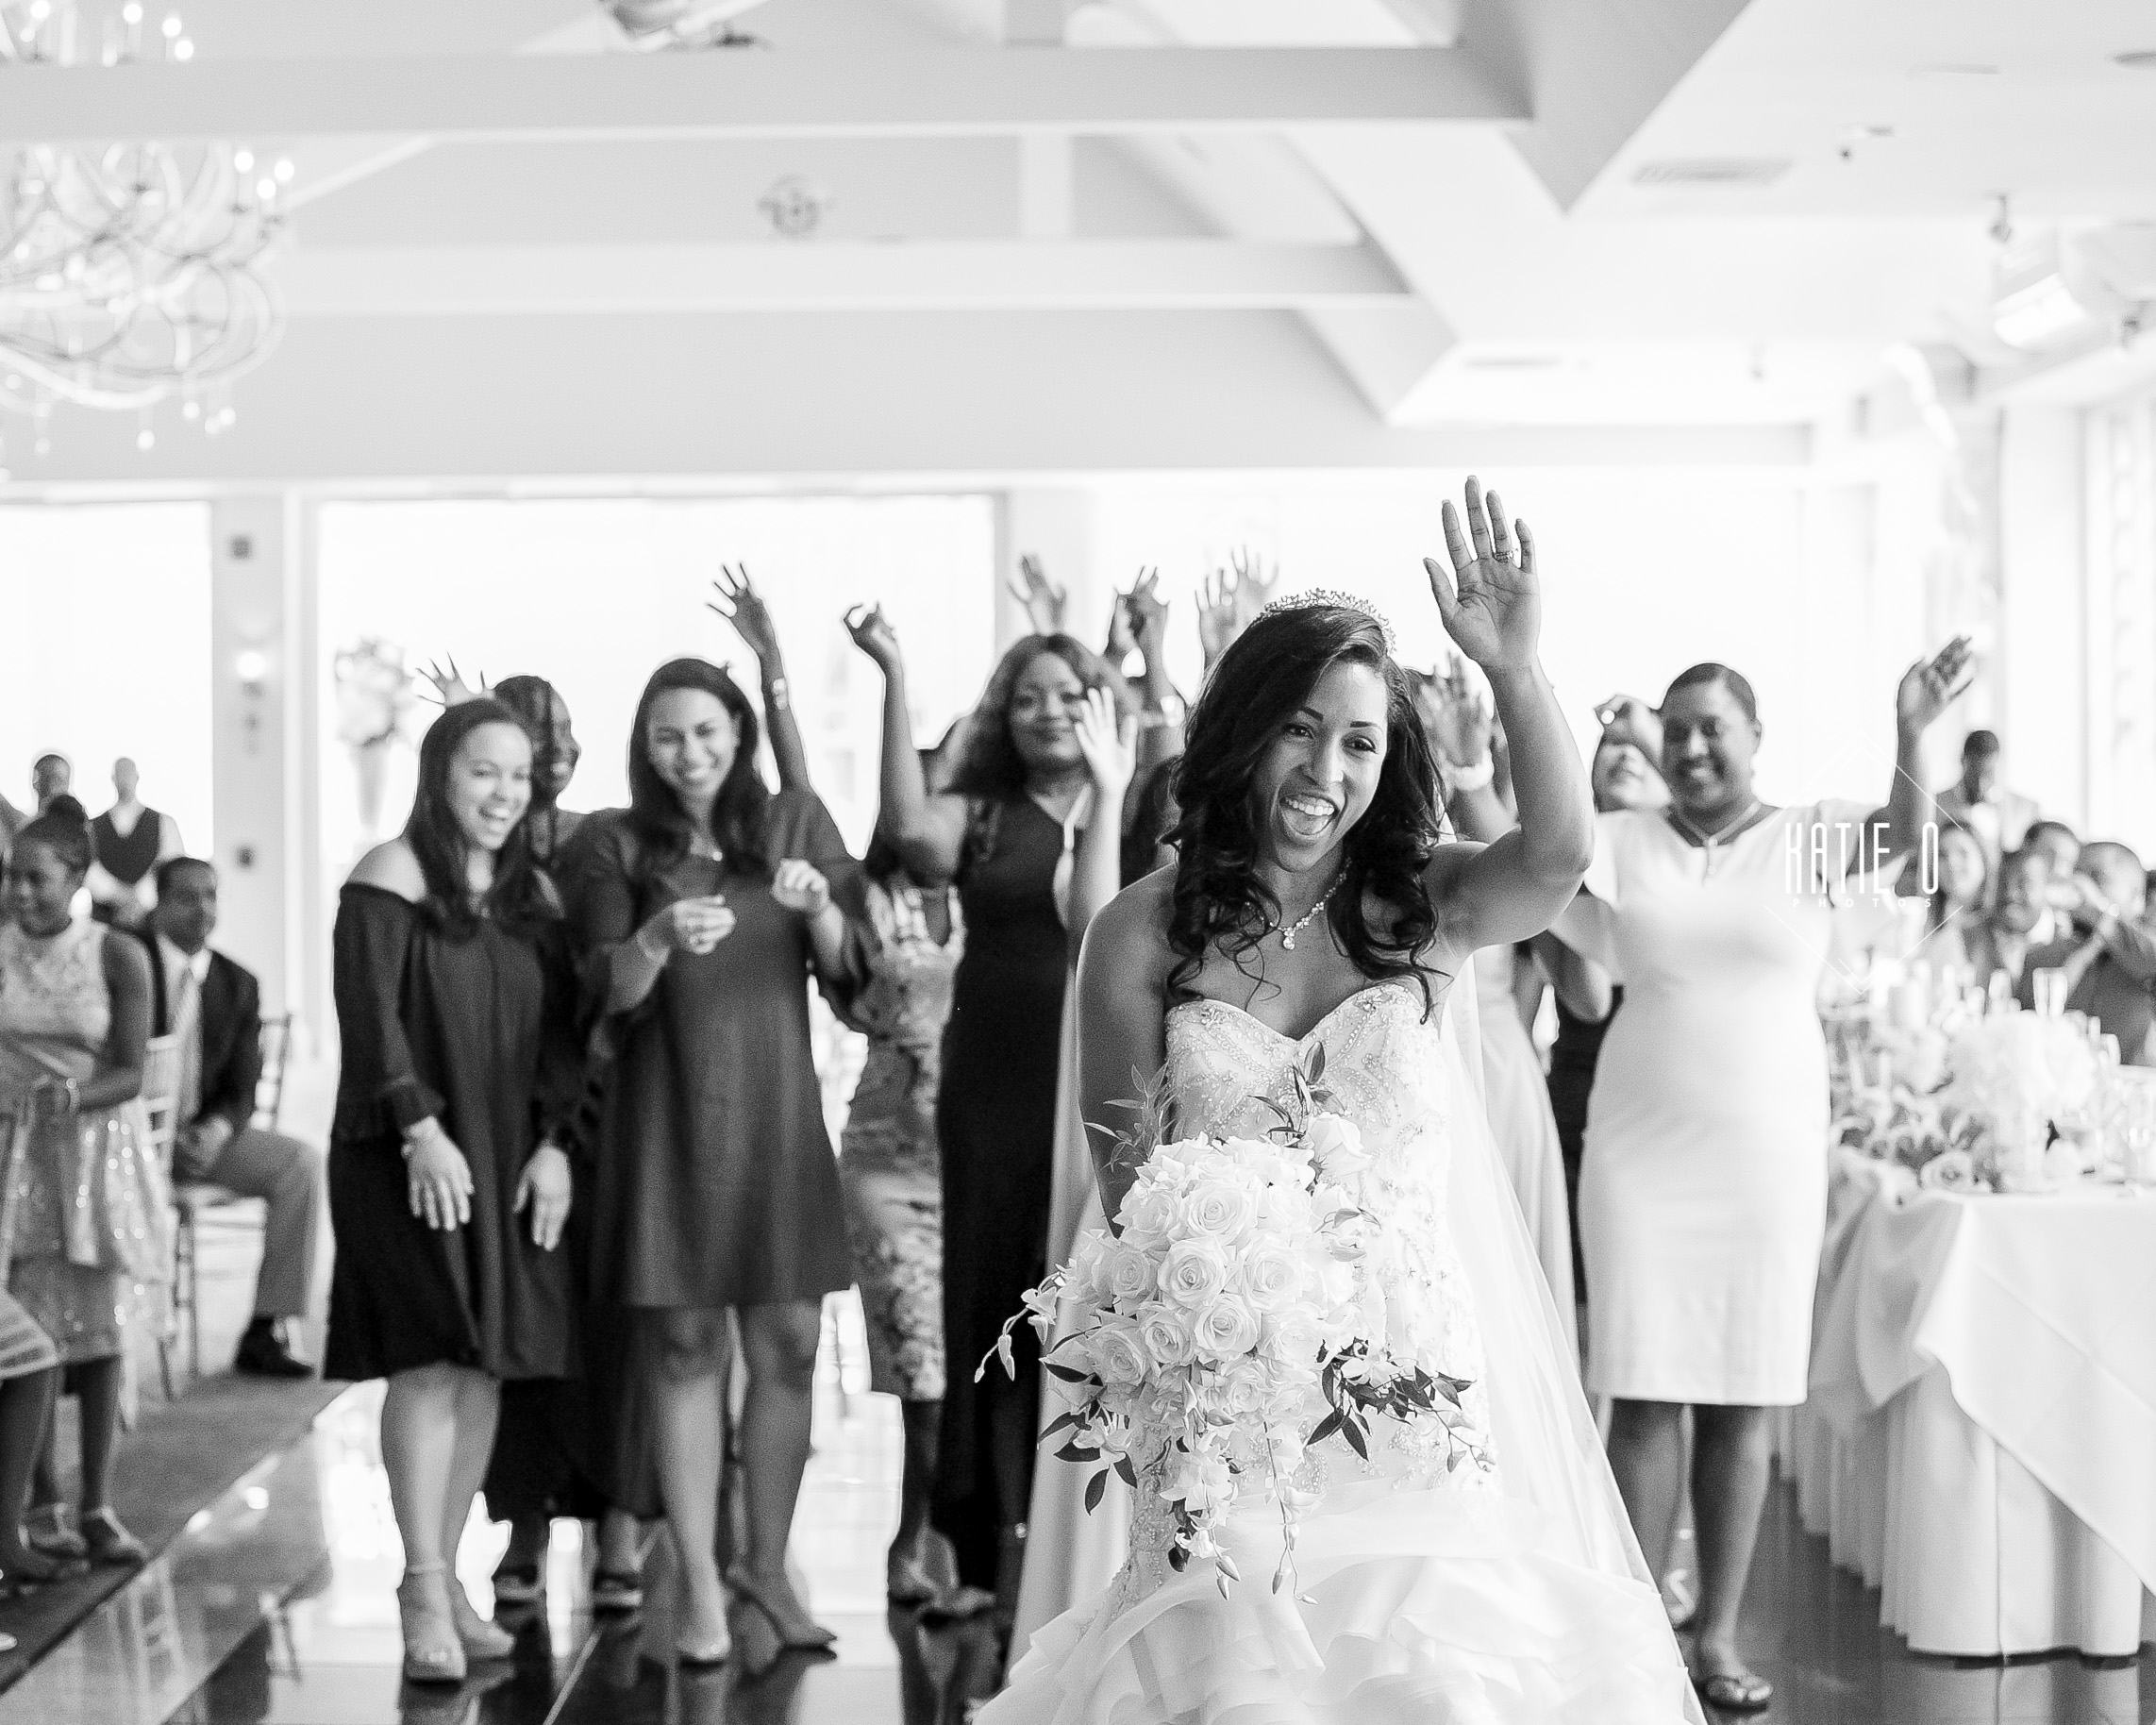 CT-WEDDING-PHOTOGRAPHER-BLOG-59.jpg